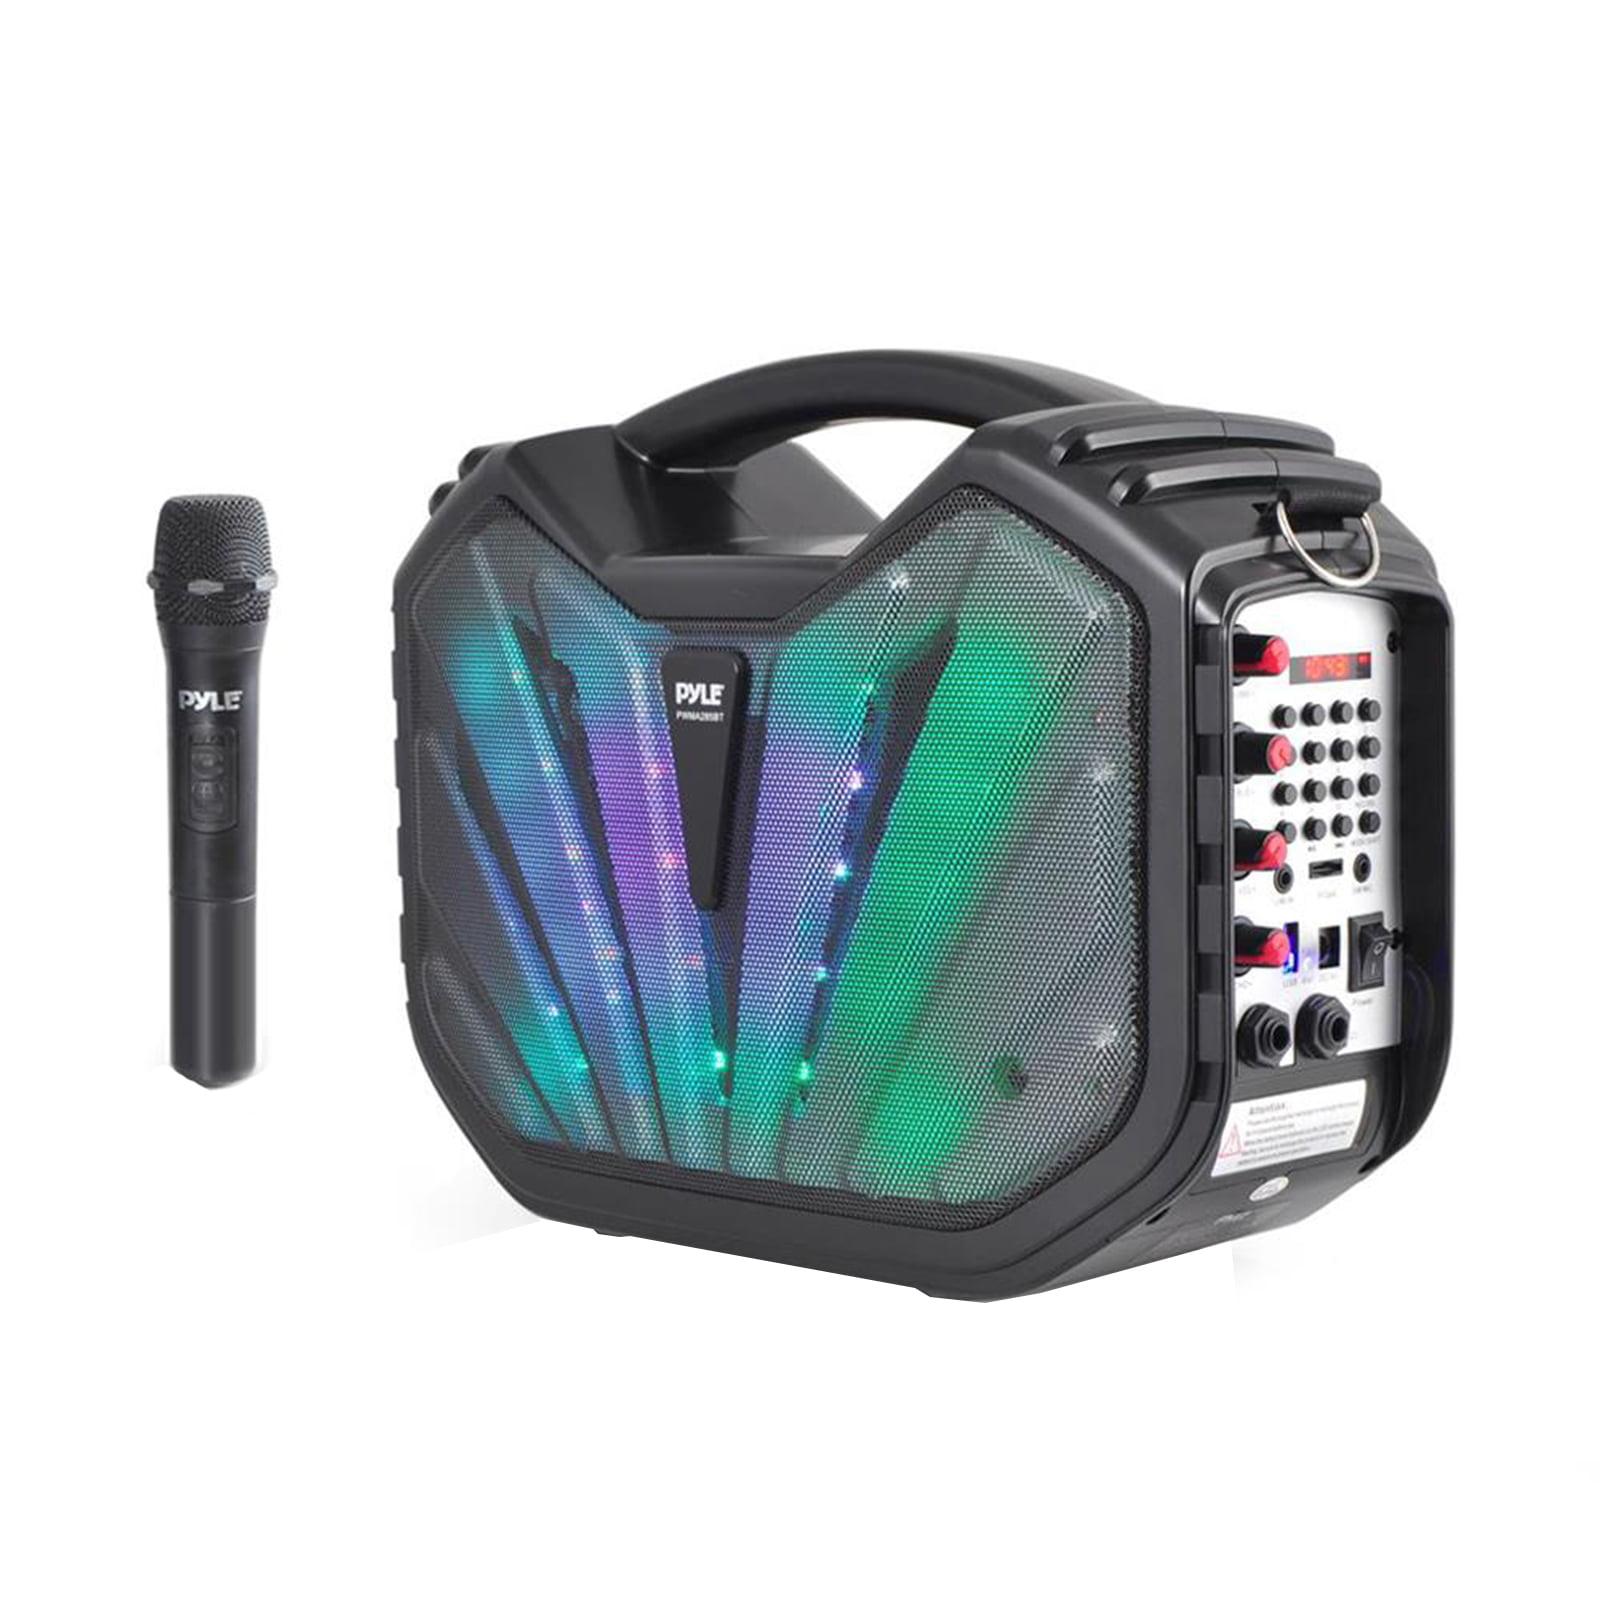 Portable BT Karaoke Speaker System, Flashing DJ Lights, Built-in Battery, Microphone, Recording Ability, MP3/USB/SD/FM Radio